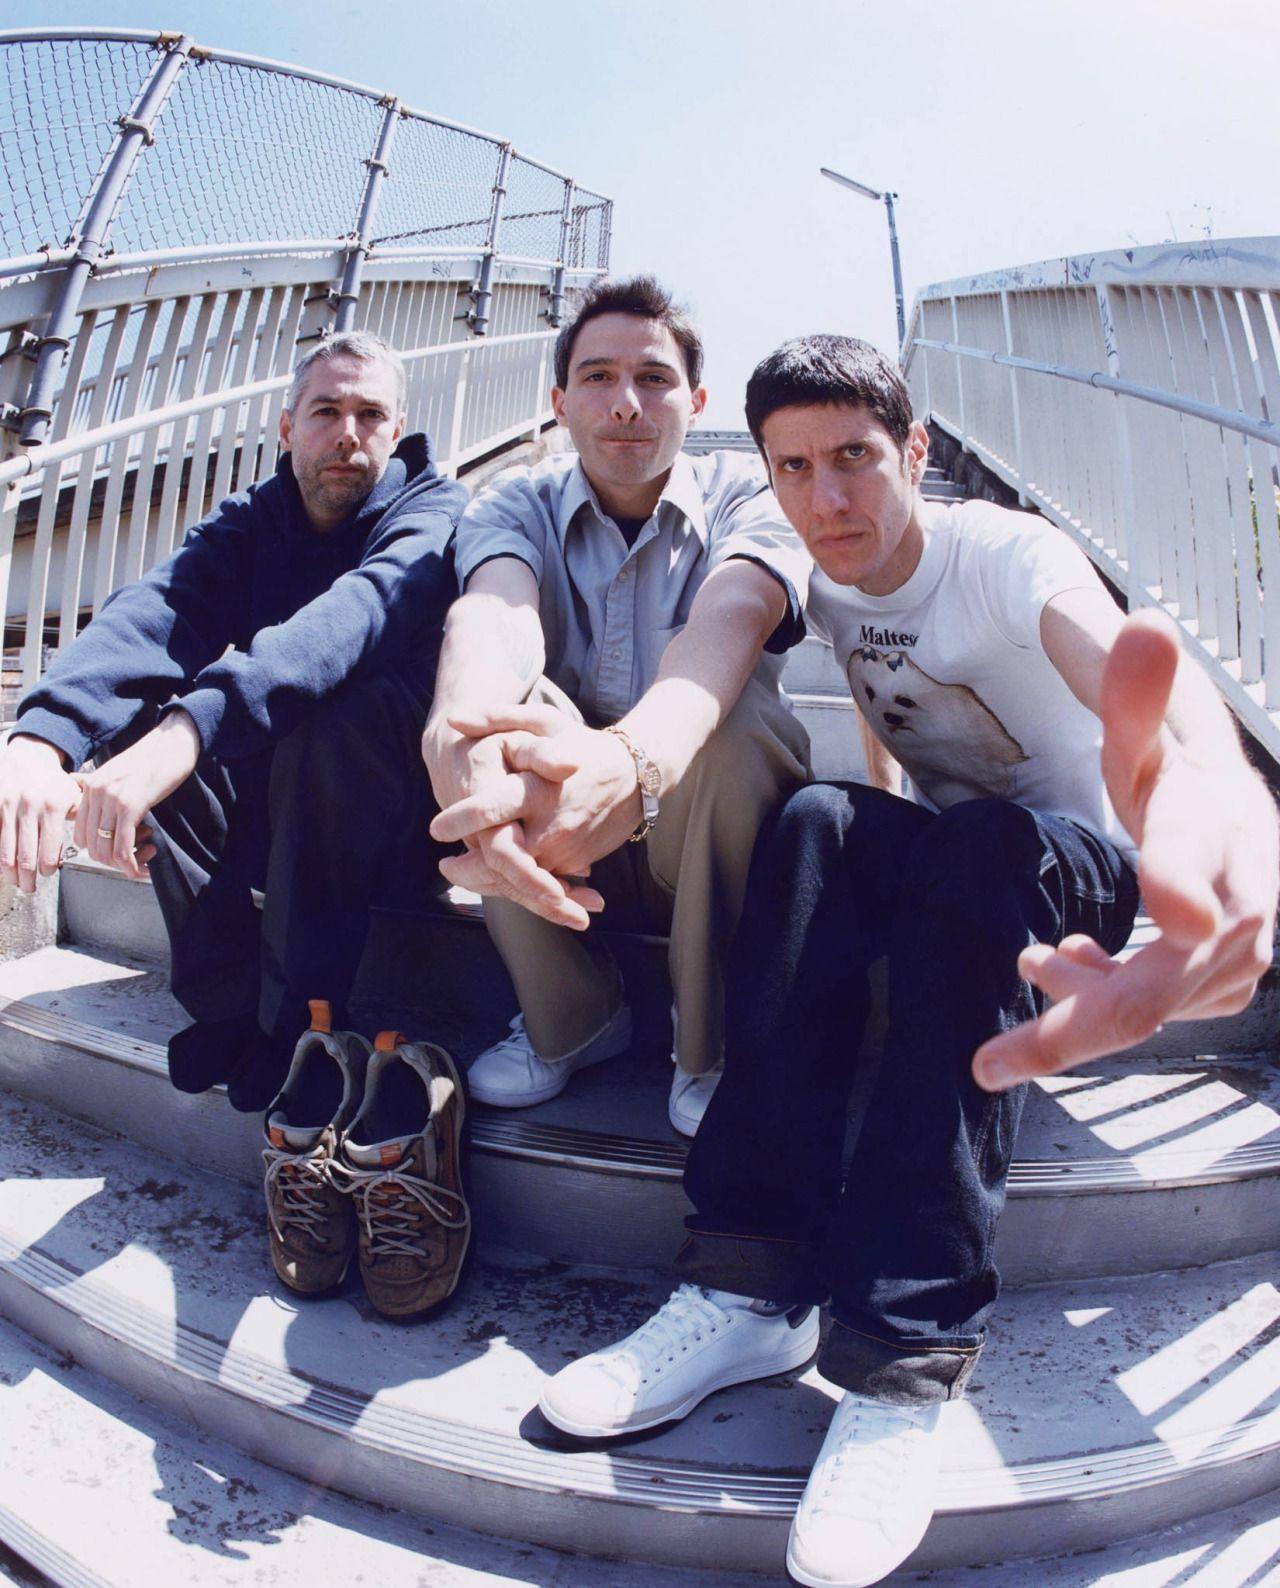 Hiphopraprb beastie boys music love music bands